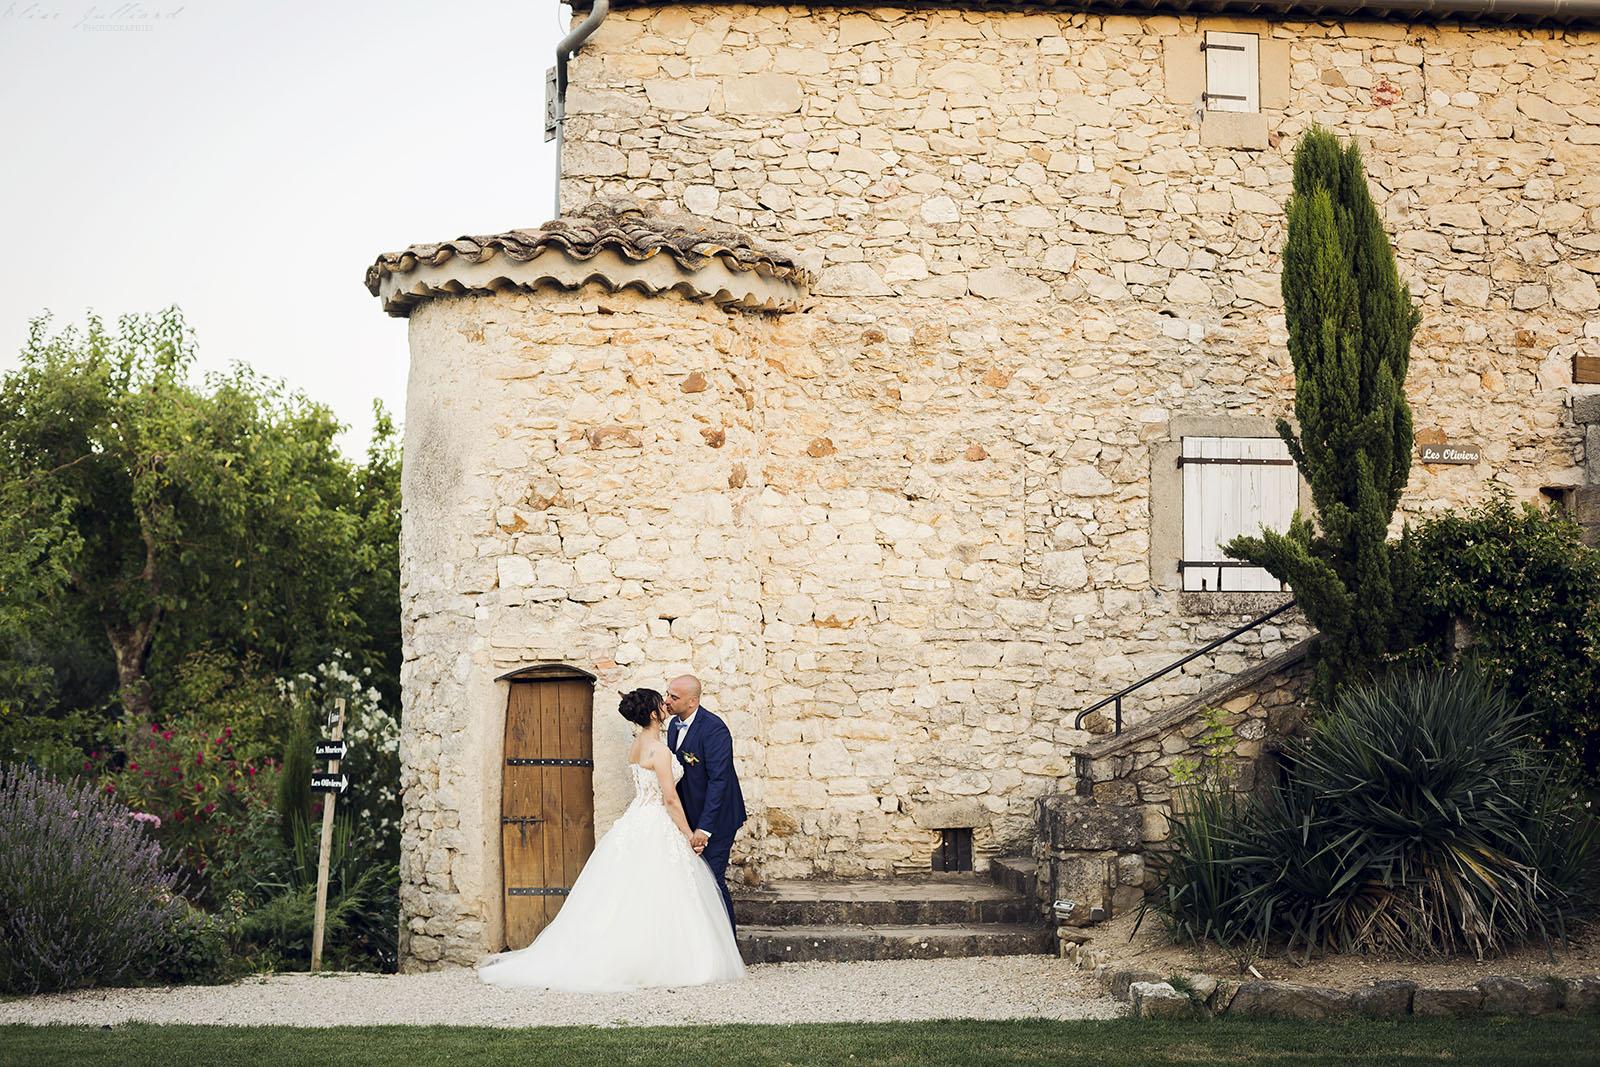 mariage-nimes-provence-alpes-cote-azue-languedoc-occitanie-domaine-la-baraque-de-serignac-alliances-olivier-wedding-reportage-seance-photo-couple-elise-julliard-photographe-2